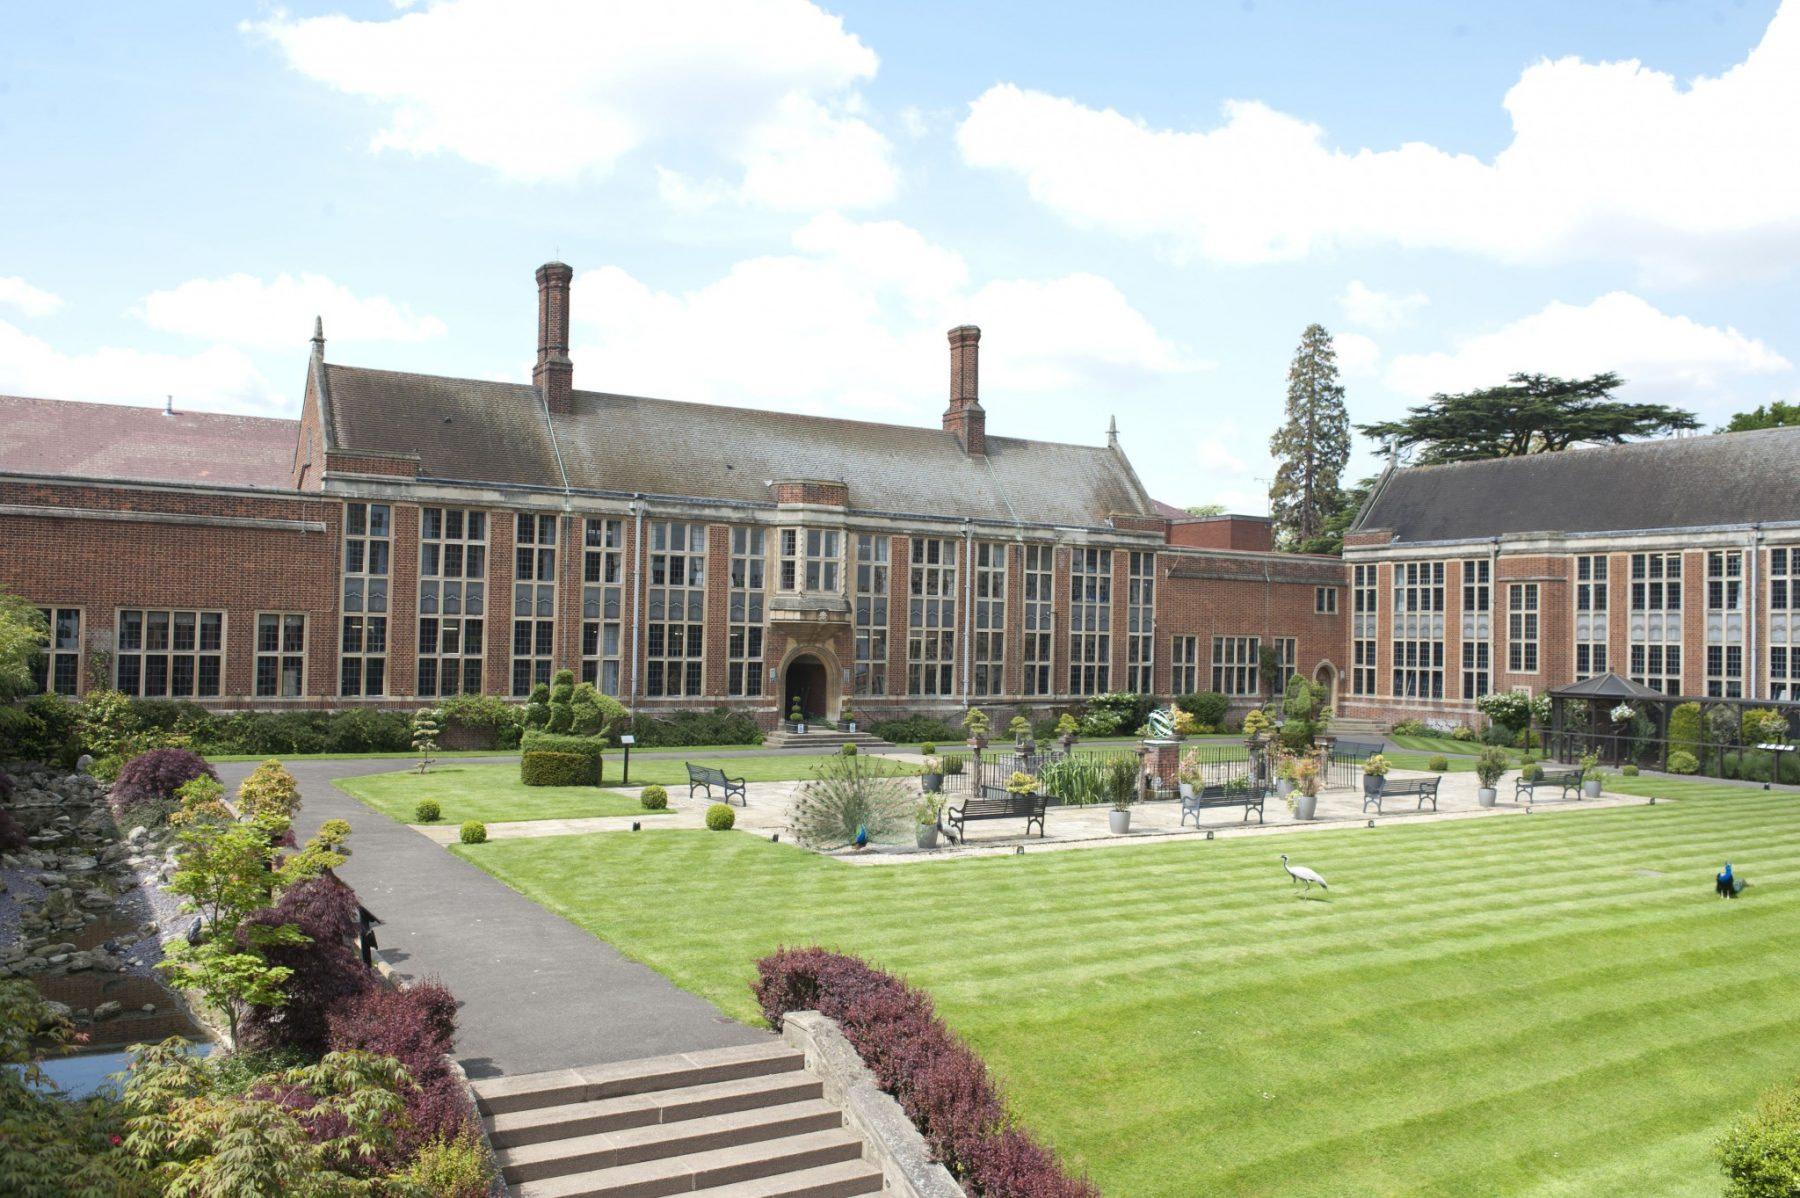 Whitgift Summer School - Campamento inglés cerca de Londres, Inglaterra